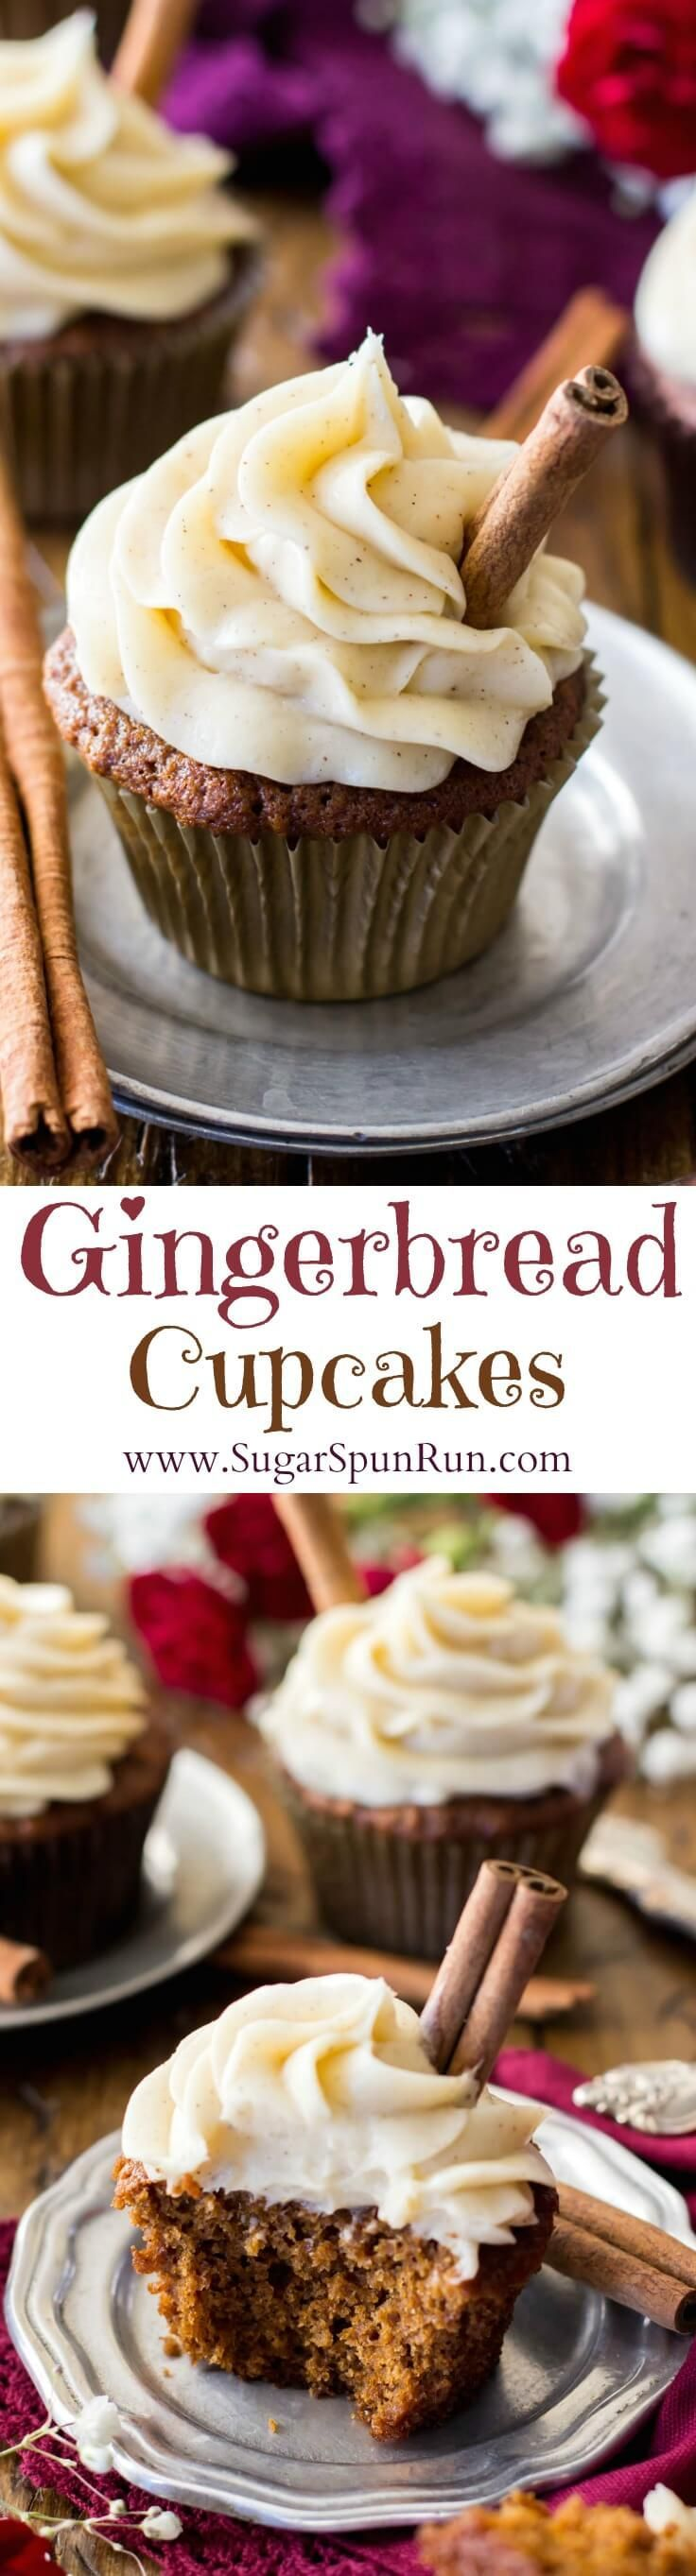 Gingerbread Cupcakes || Sugar Spun Run